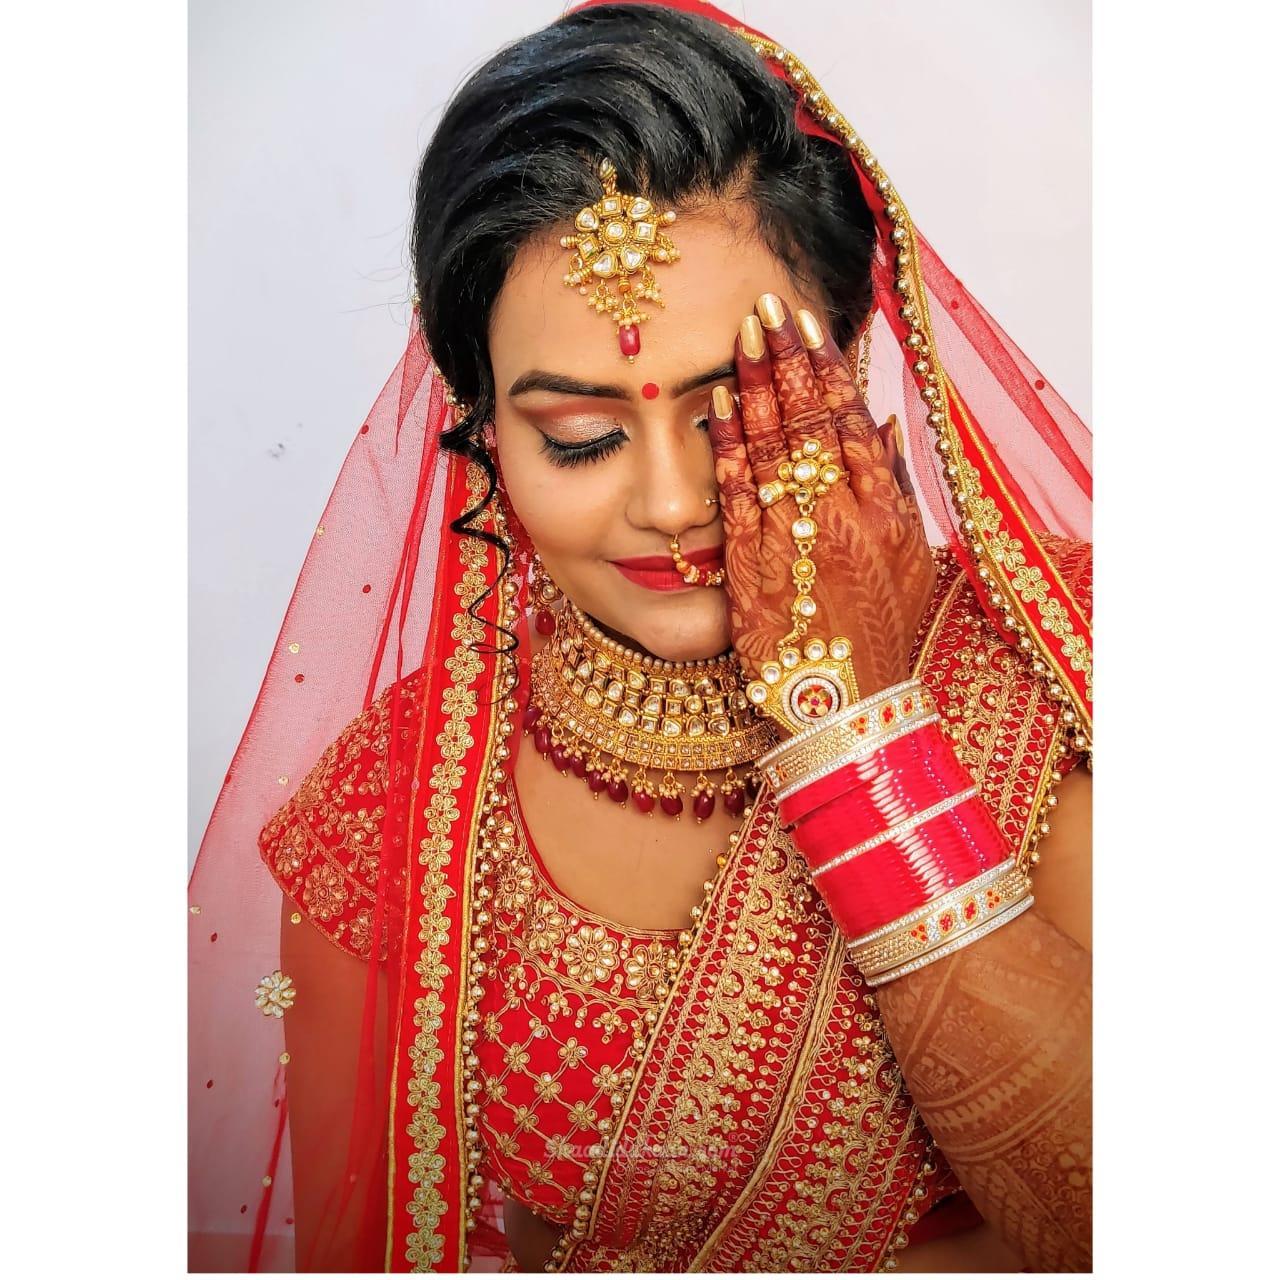 Manali Bridal Studio